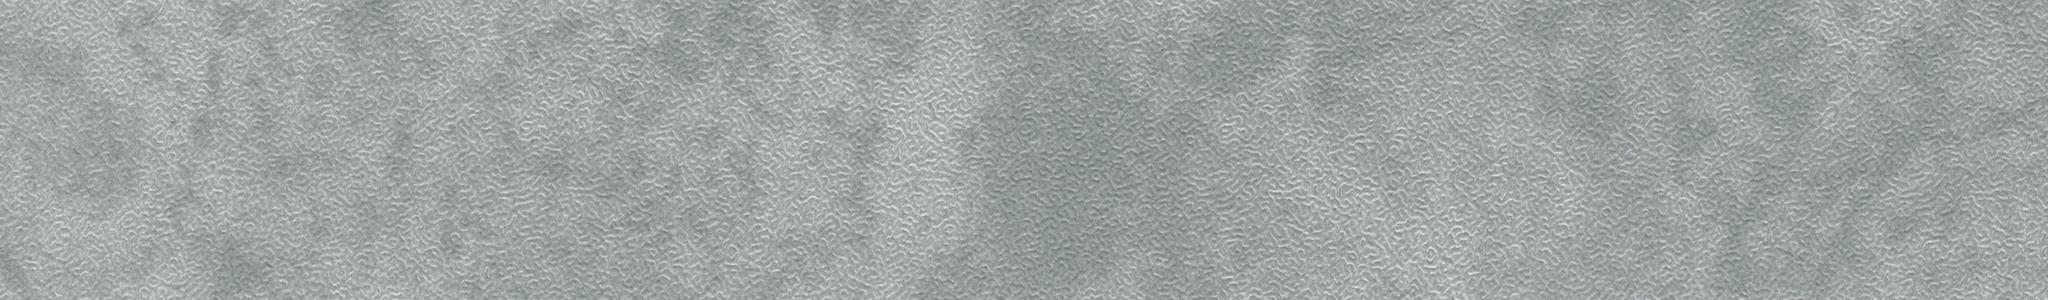 HD 296083 Кромка ABS Оксид - Шагрень